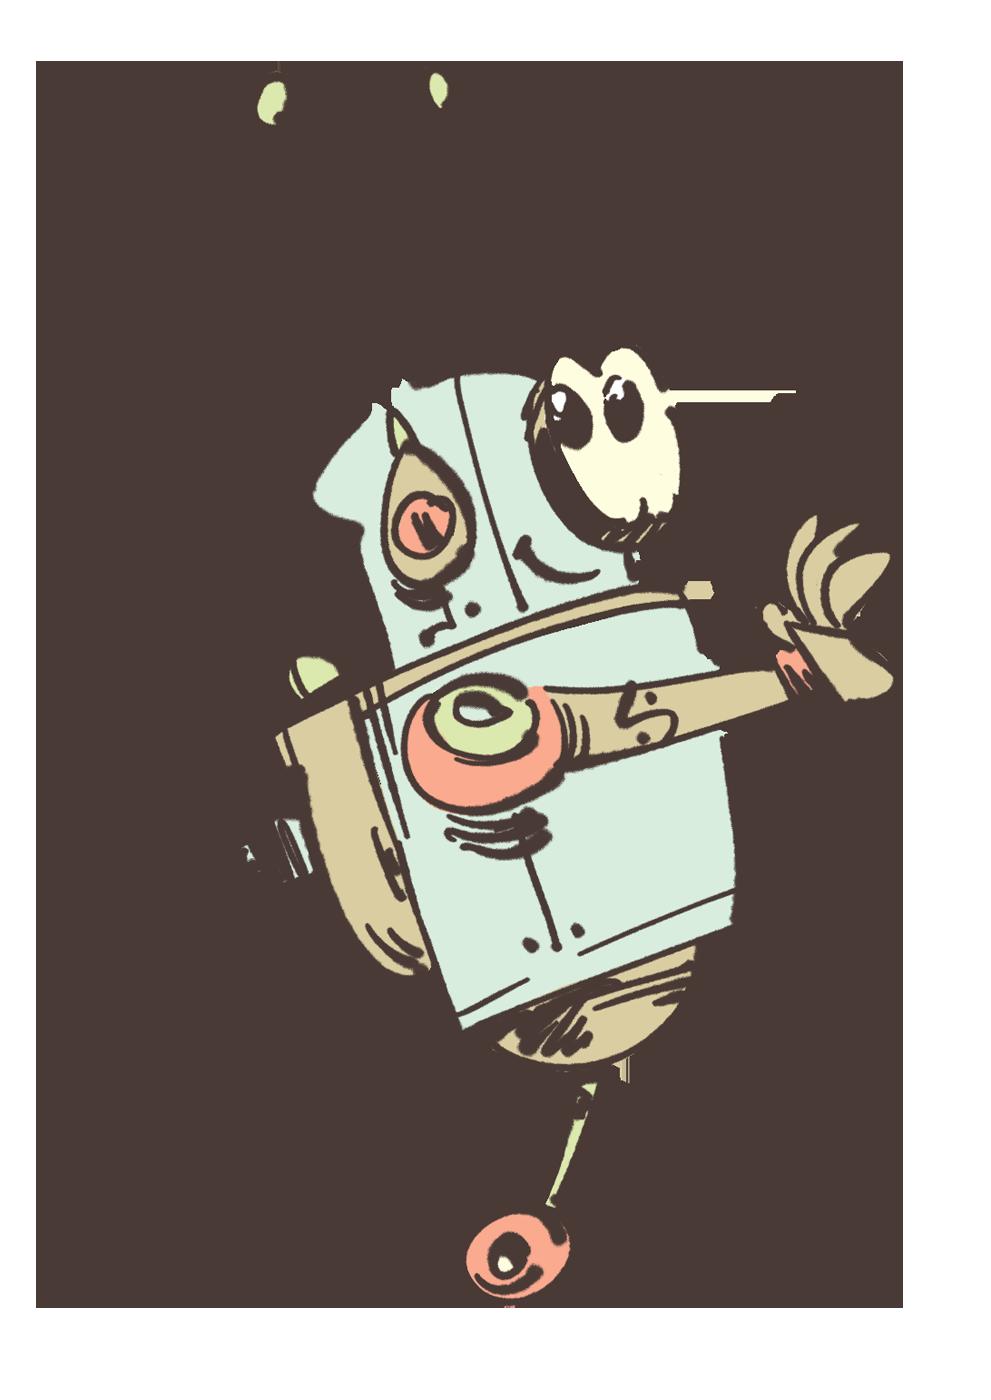 Cute robot on mono wheel - illustration by Cesare Asaro